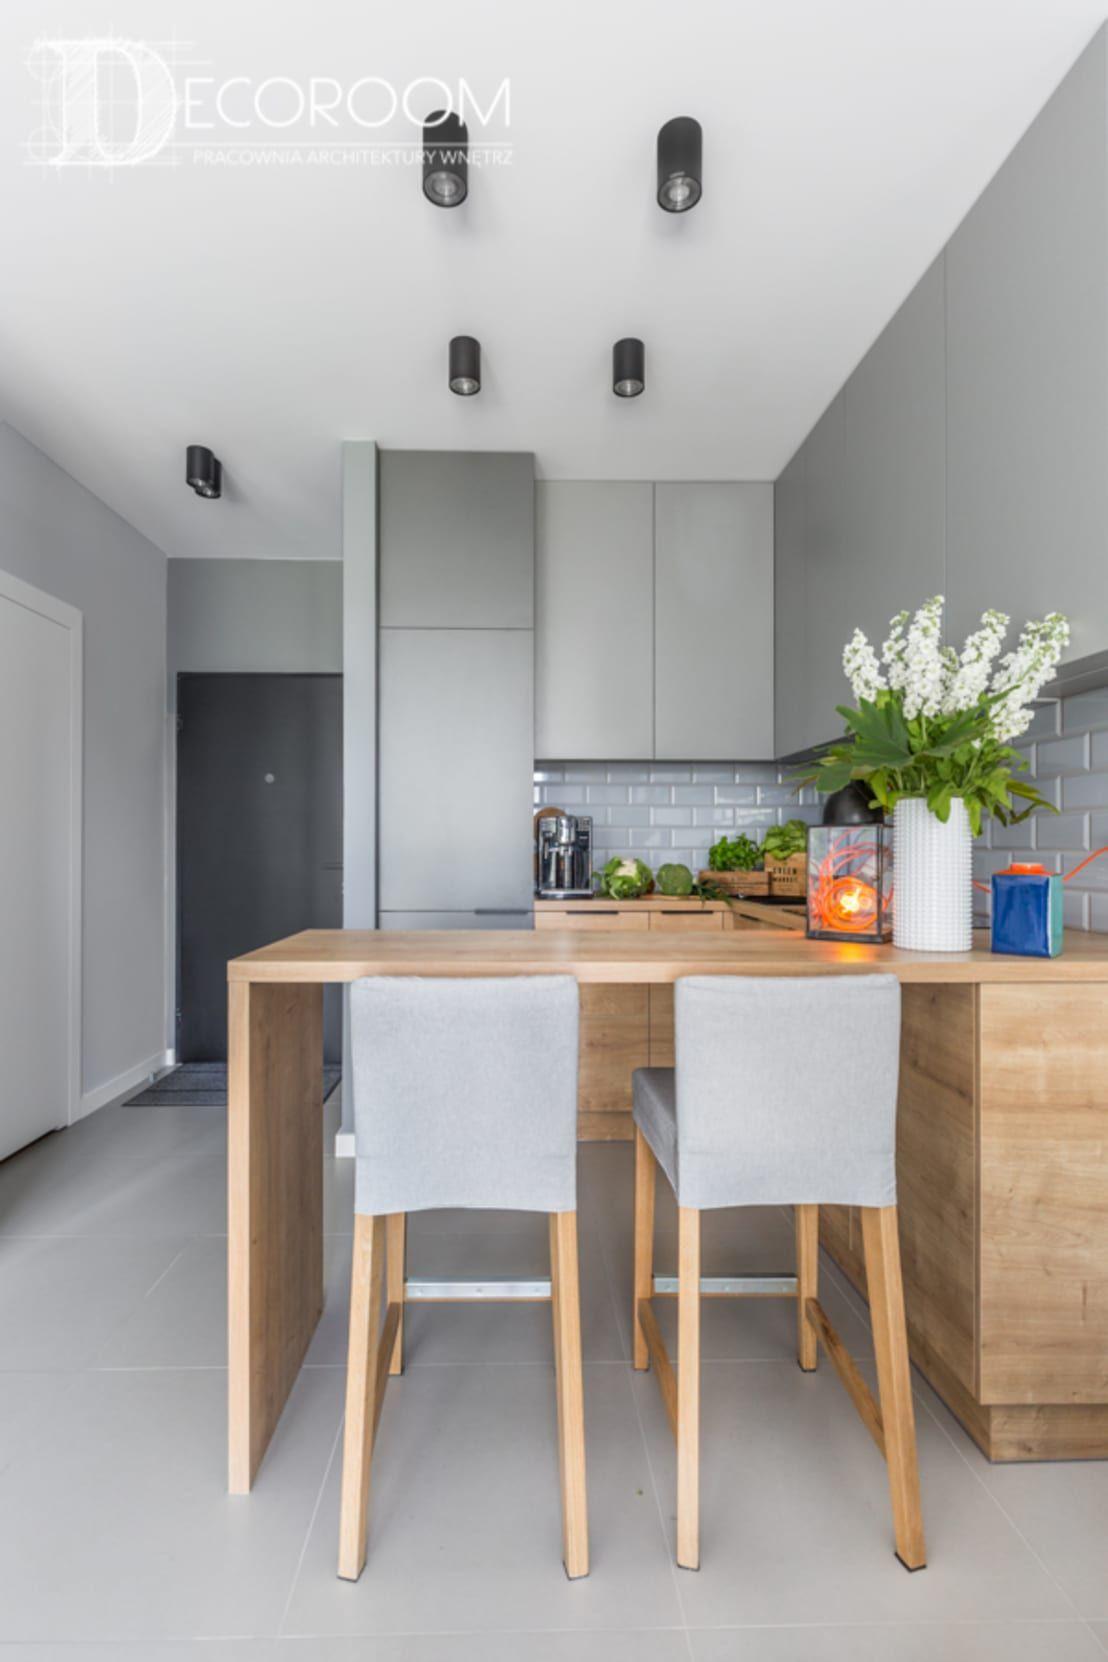 Small Kitchen Design 10x10: Kawalerka Dla Singla, Profesjonalista: Decoroom (With